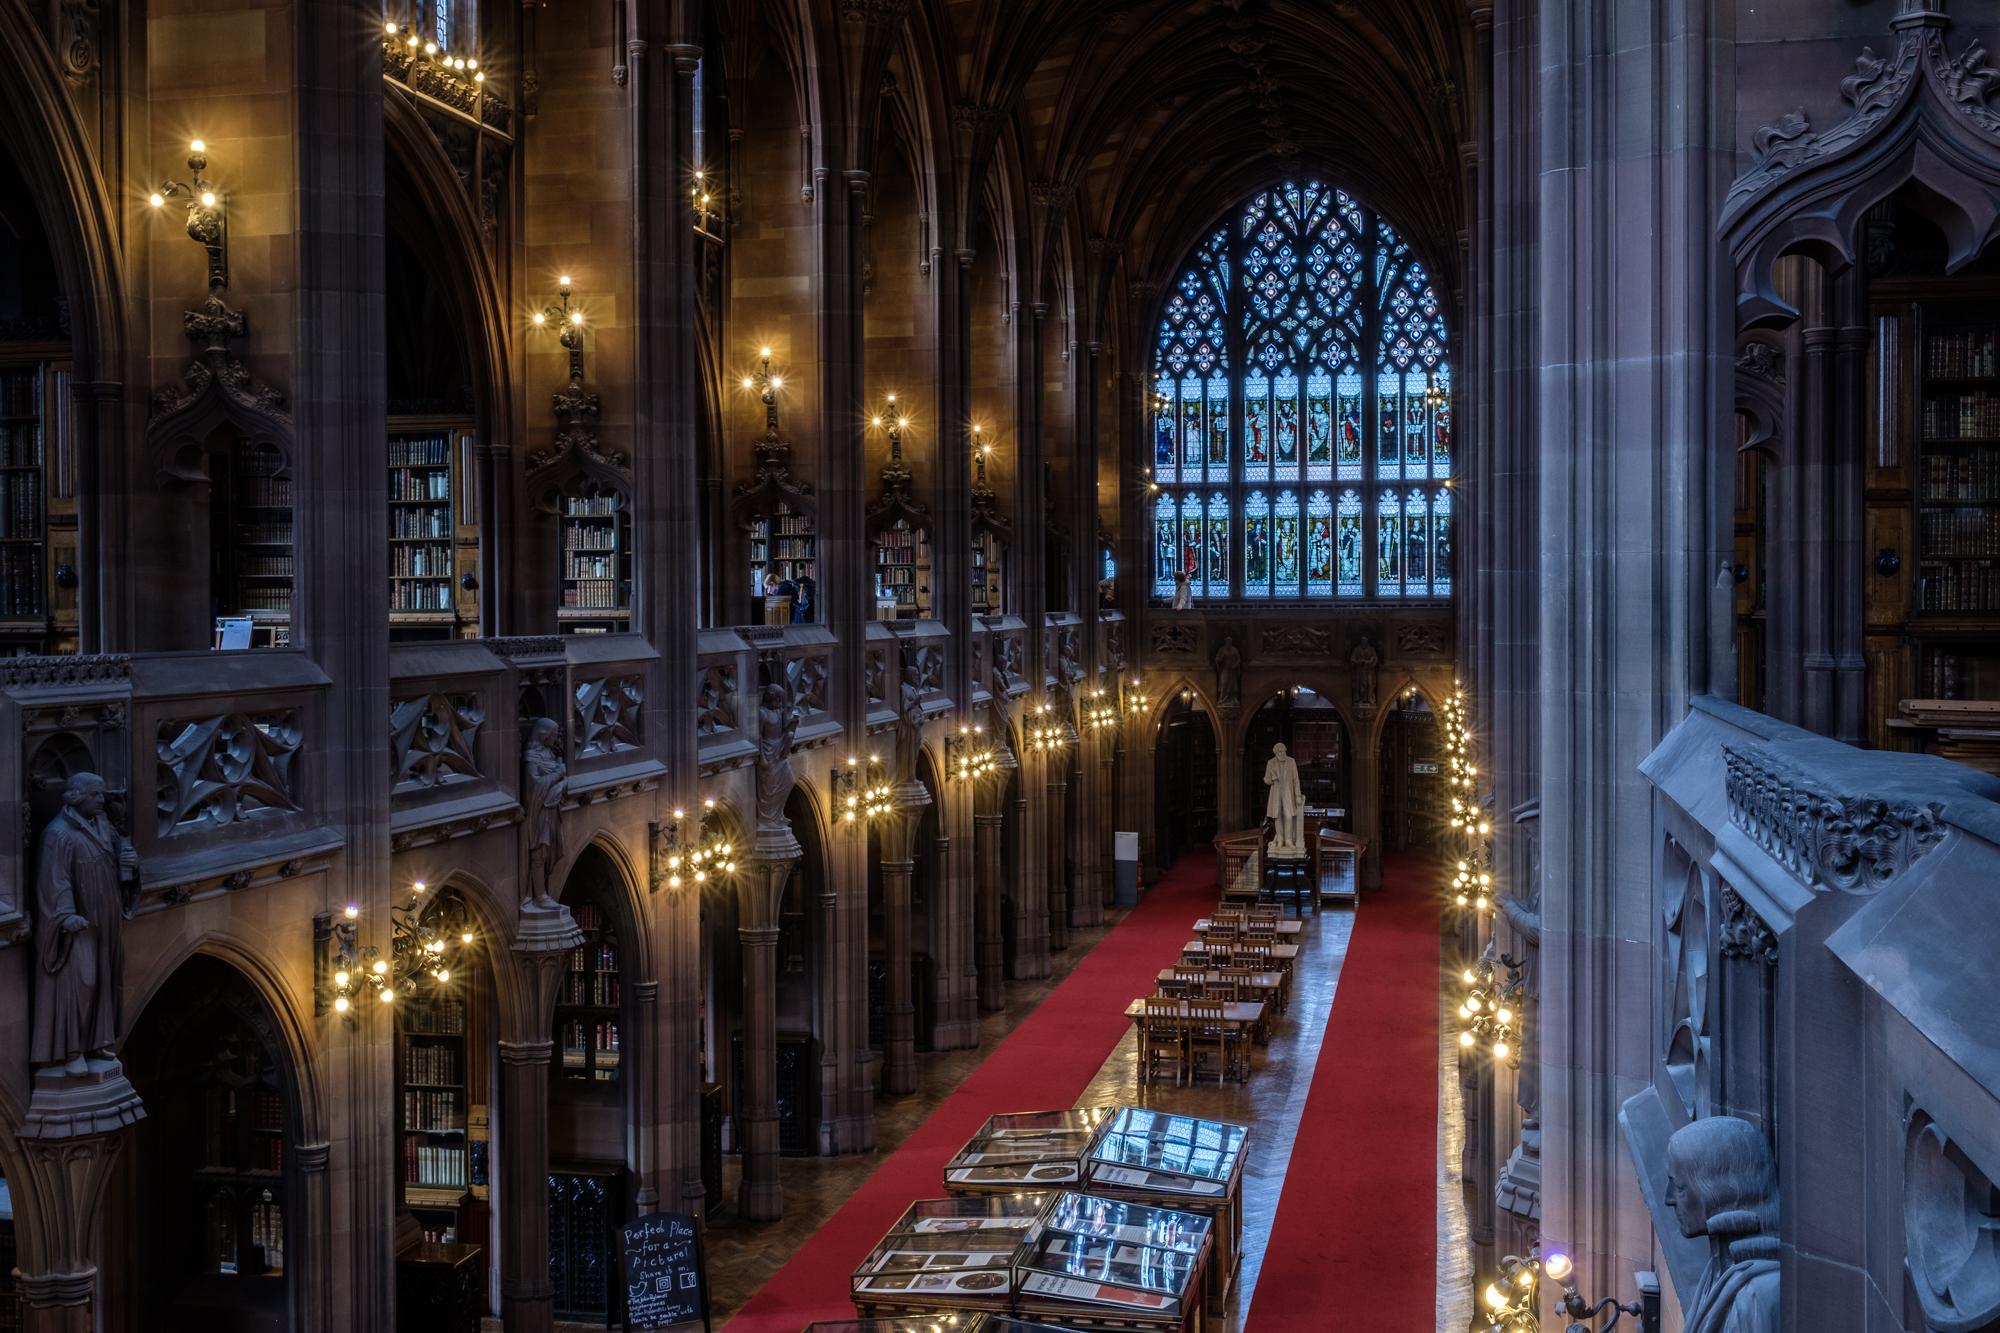 170917 John Rylands Library 6 2000px.jpg